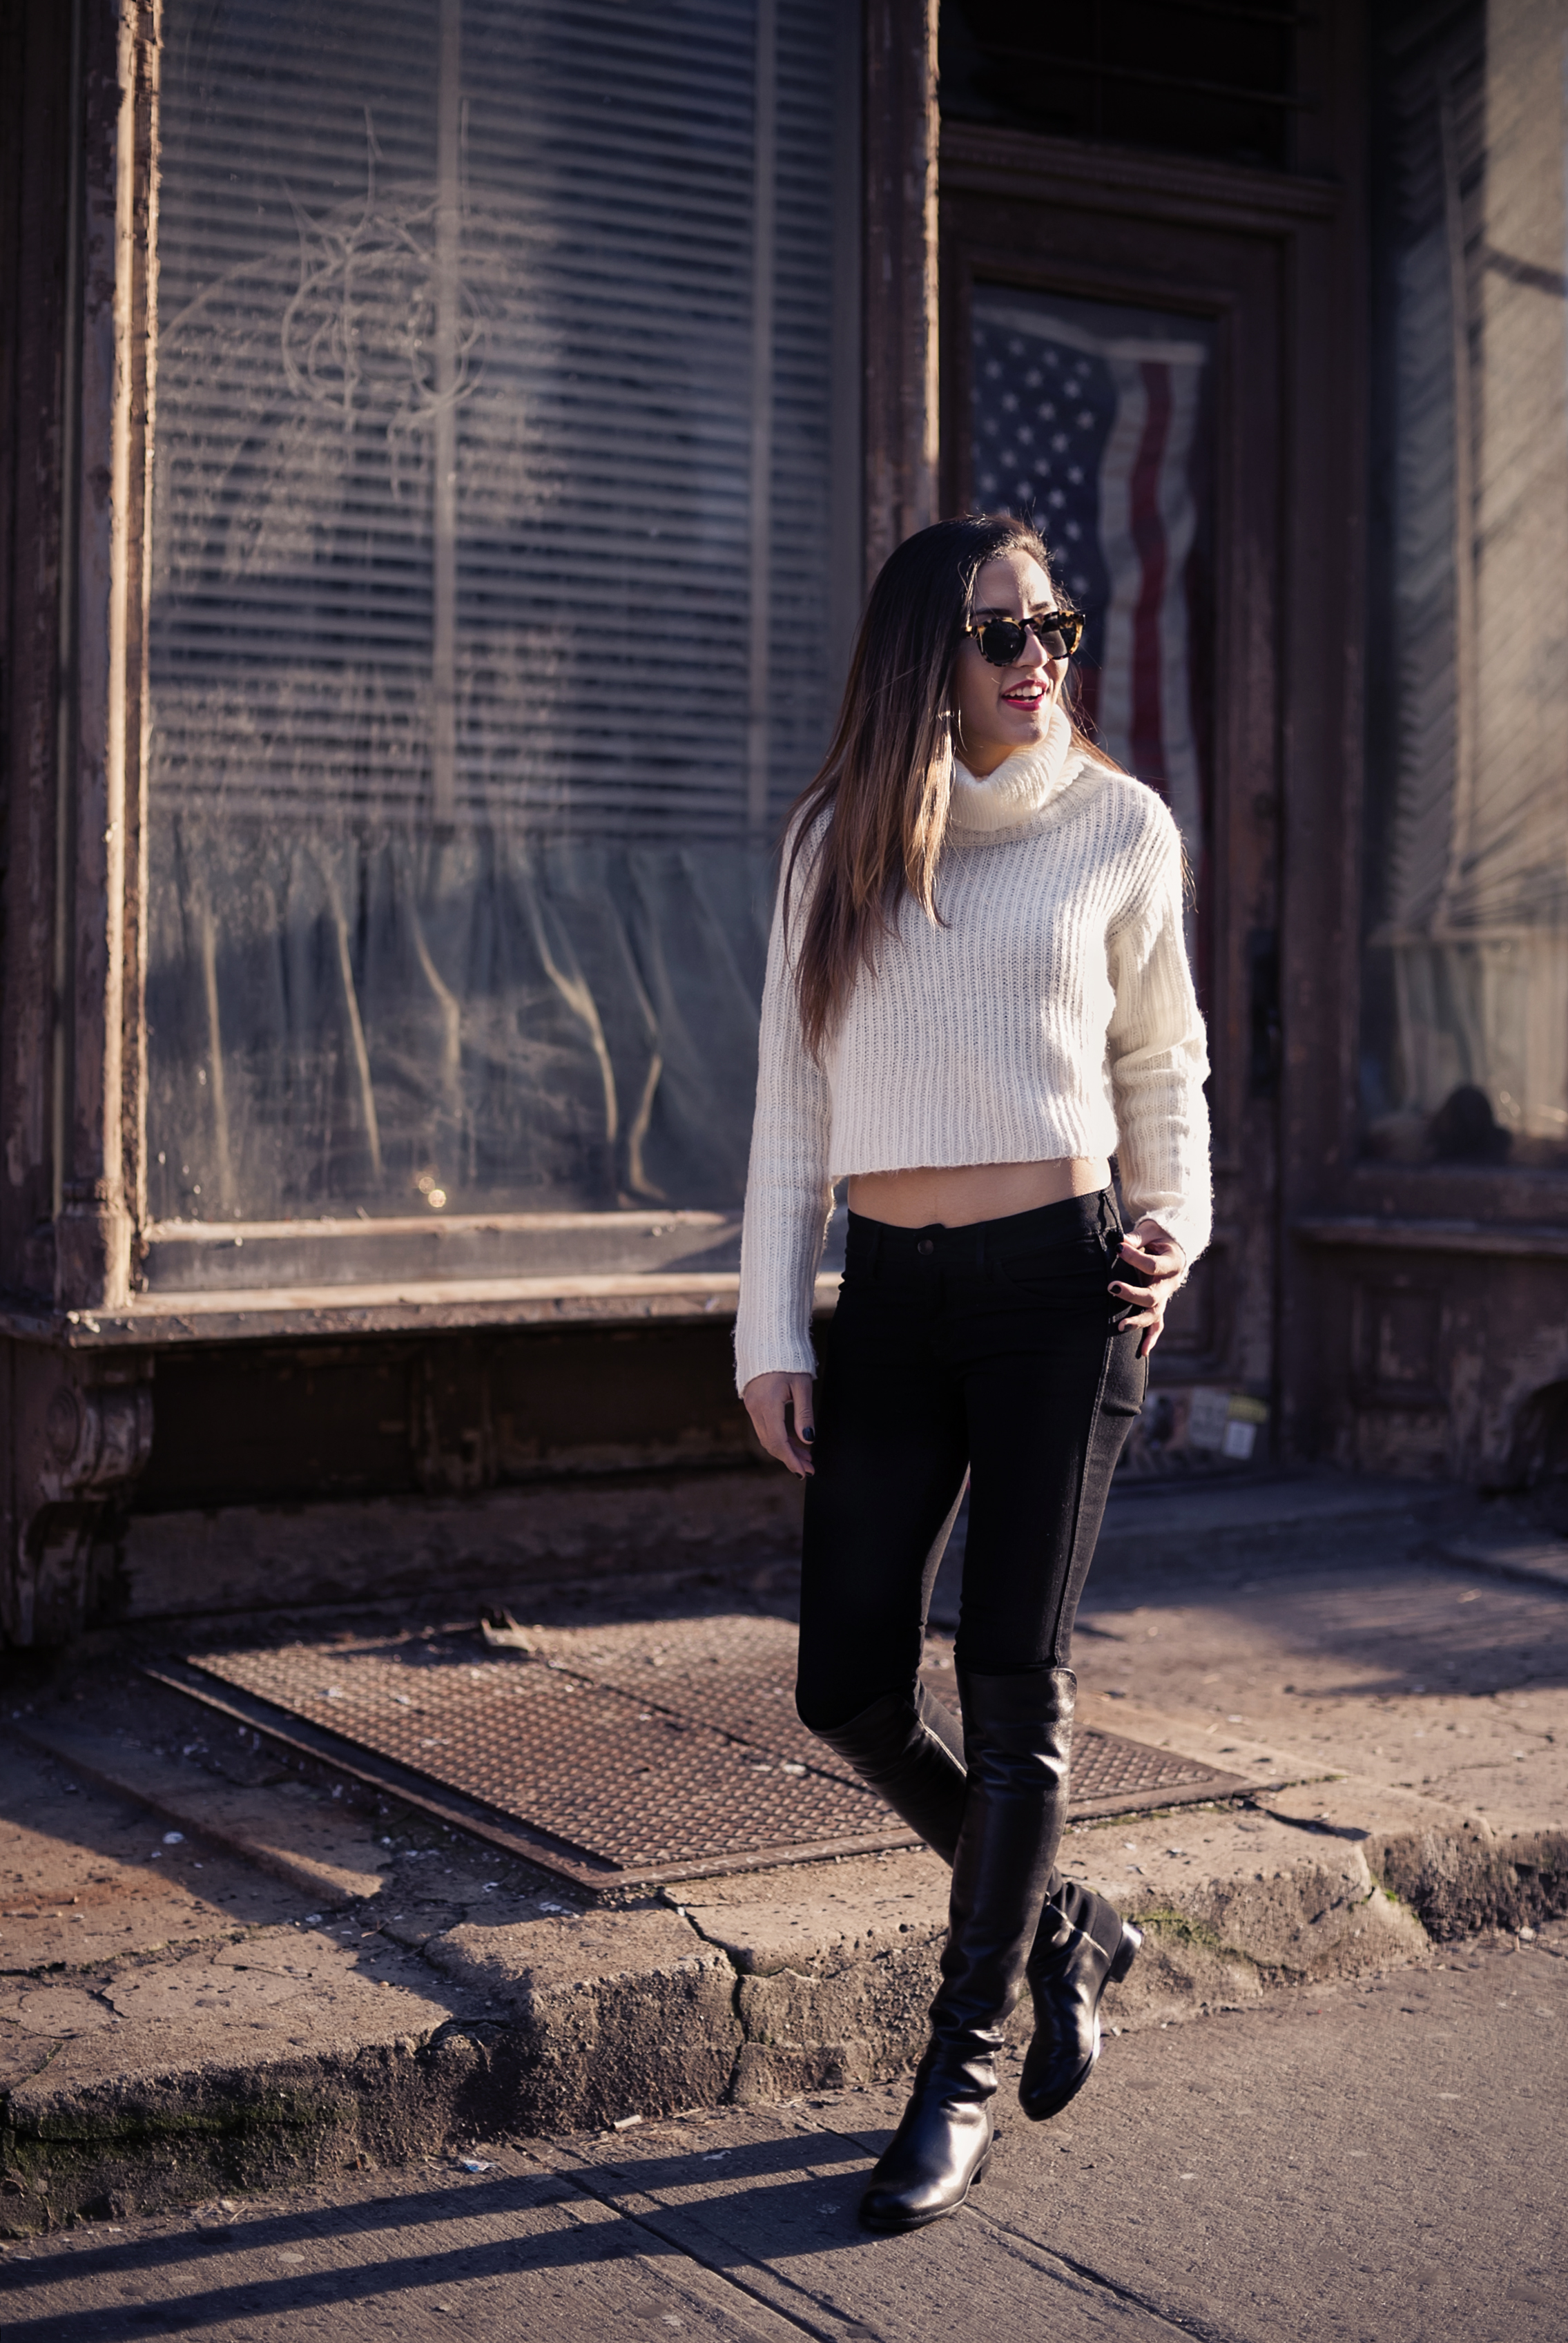 raquel_paiva_fashion_blogger_driggs_brooklyn_williamsburg